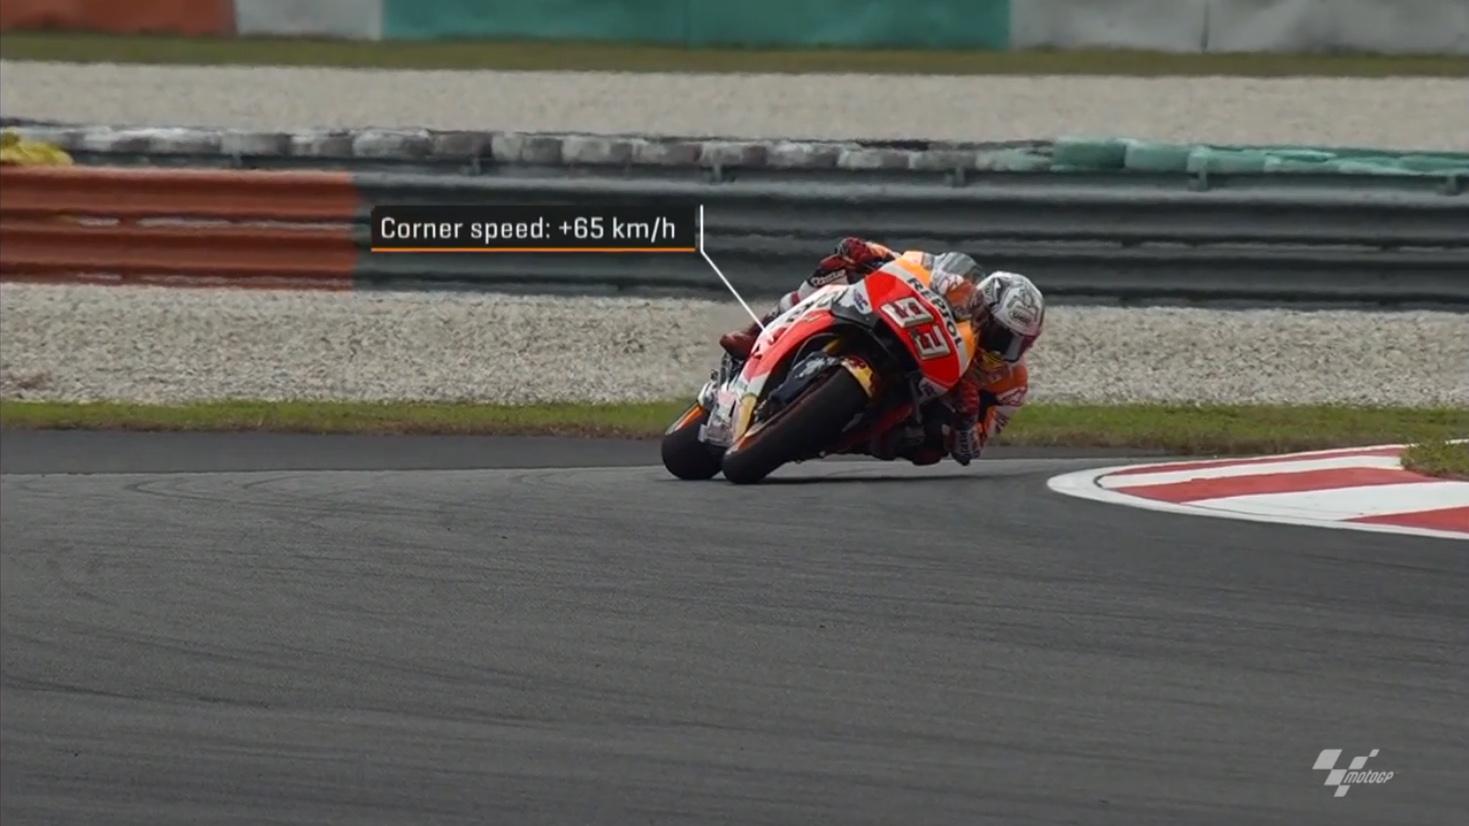 20161028_MotoGP_rds17_fp1_MM93.jpg